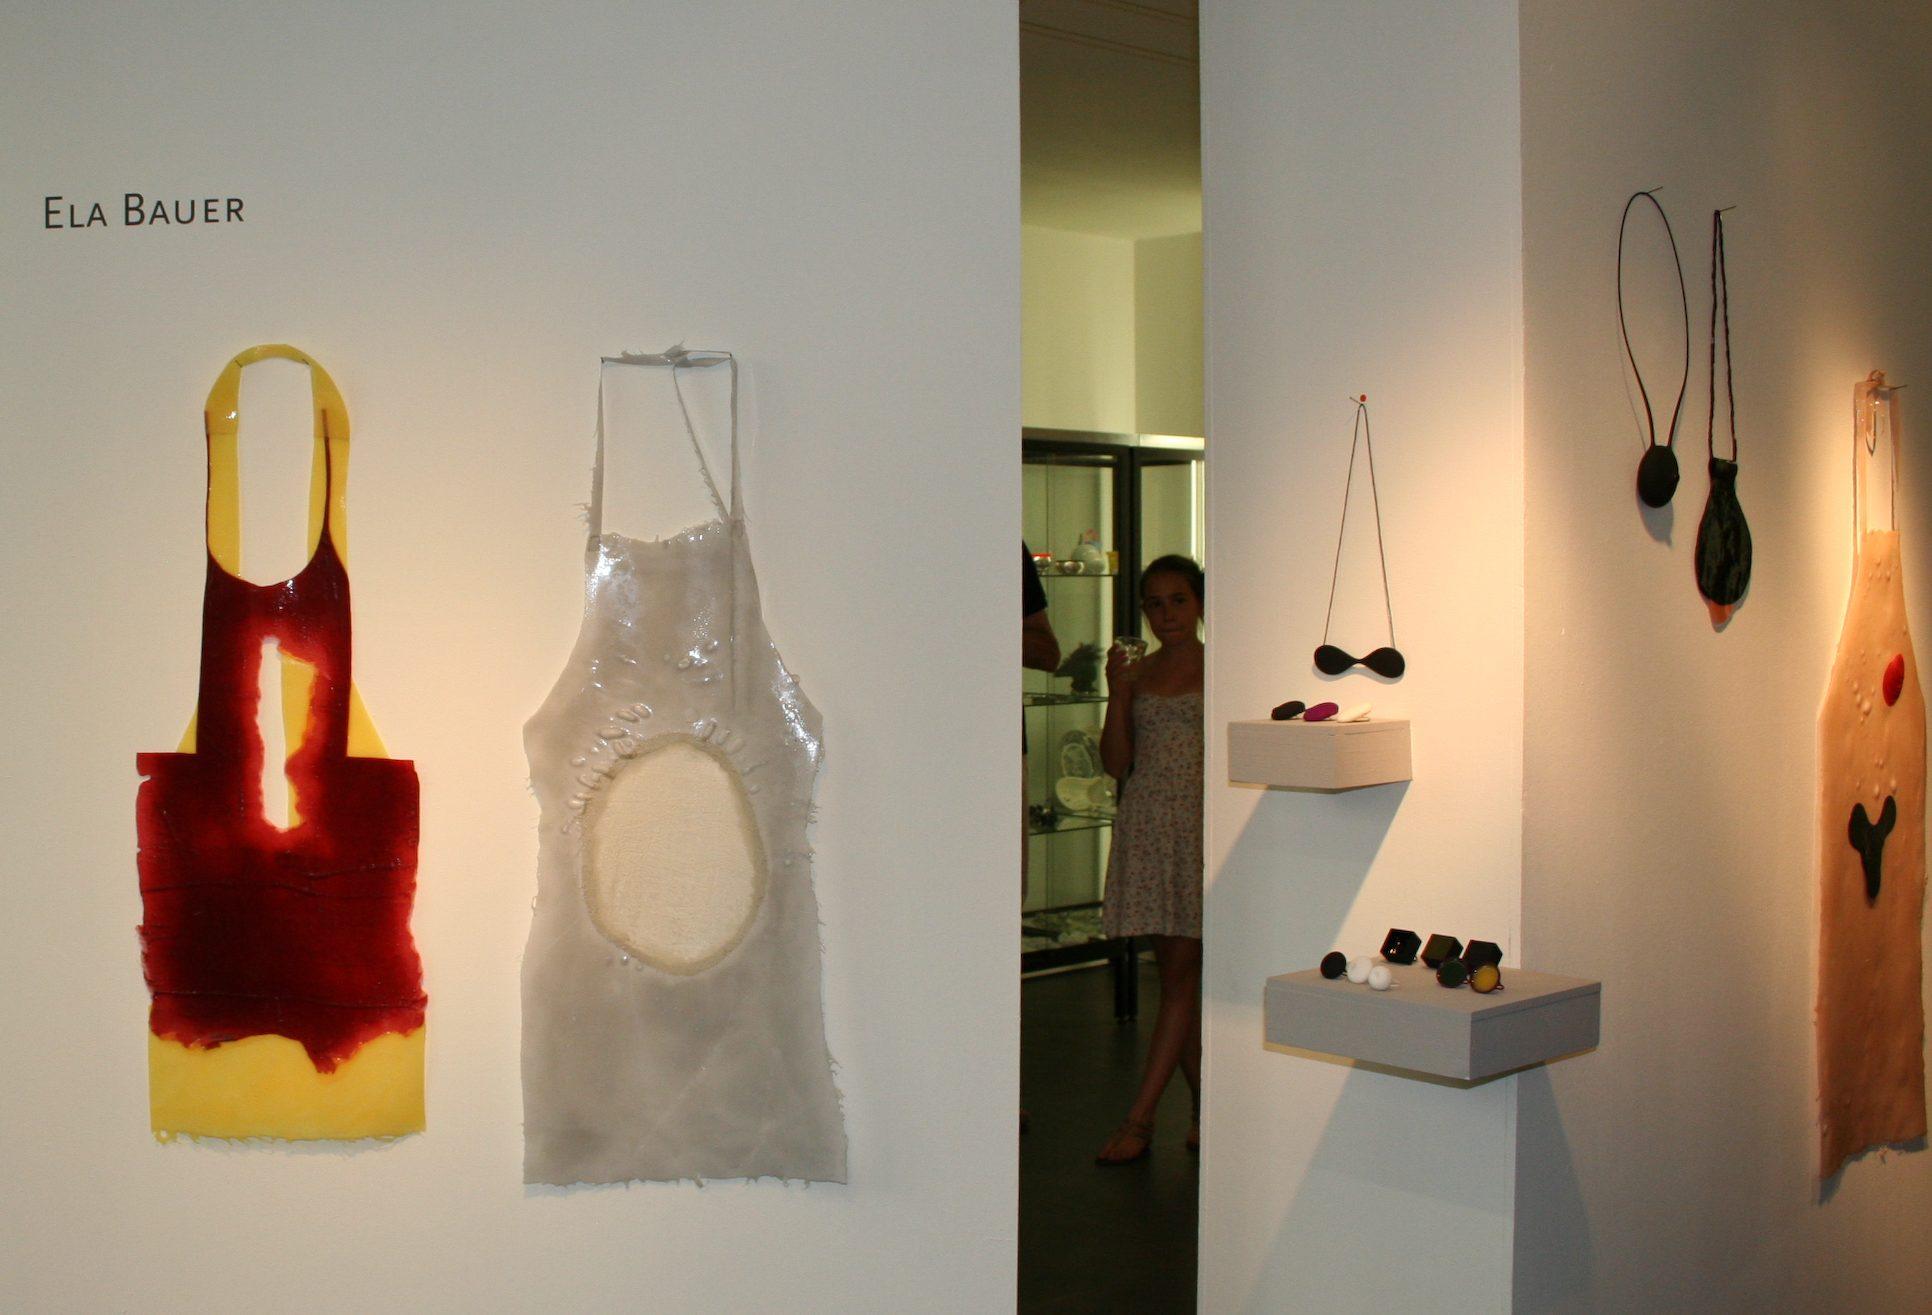 Ela Bauer in Galerie Ra, 2012. Foto met dank aan Ela Bauer©